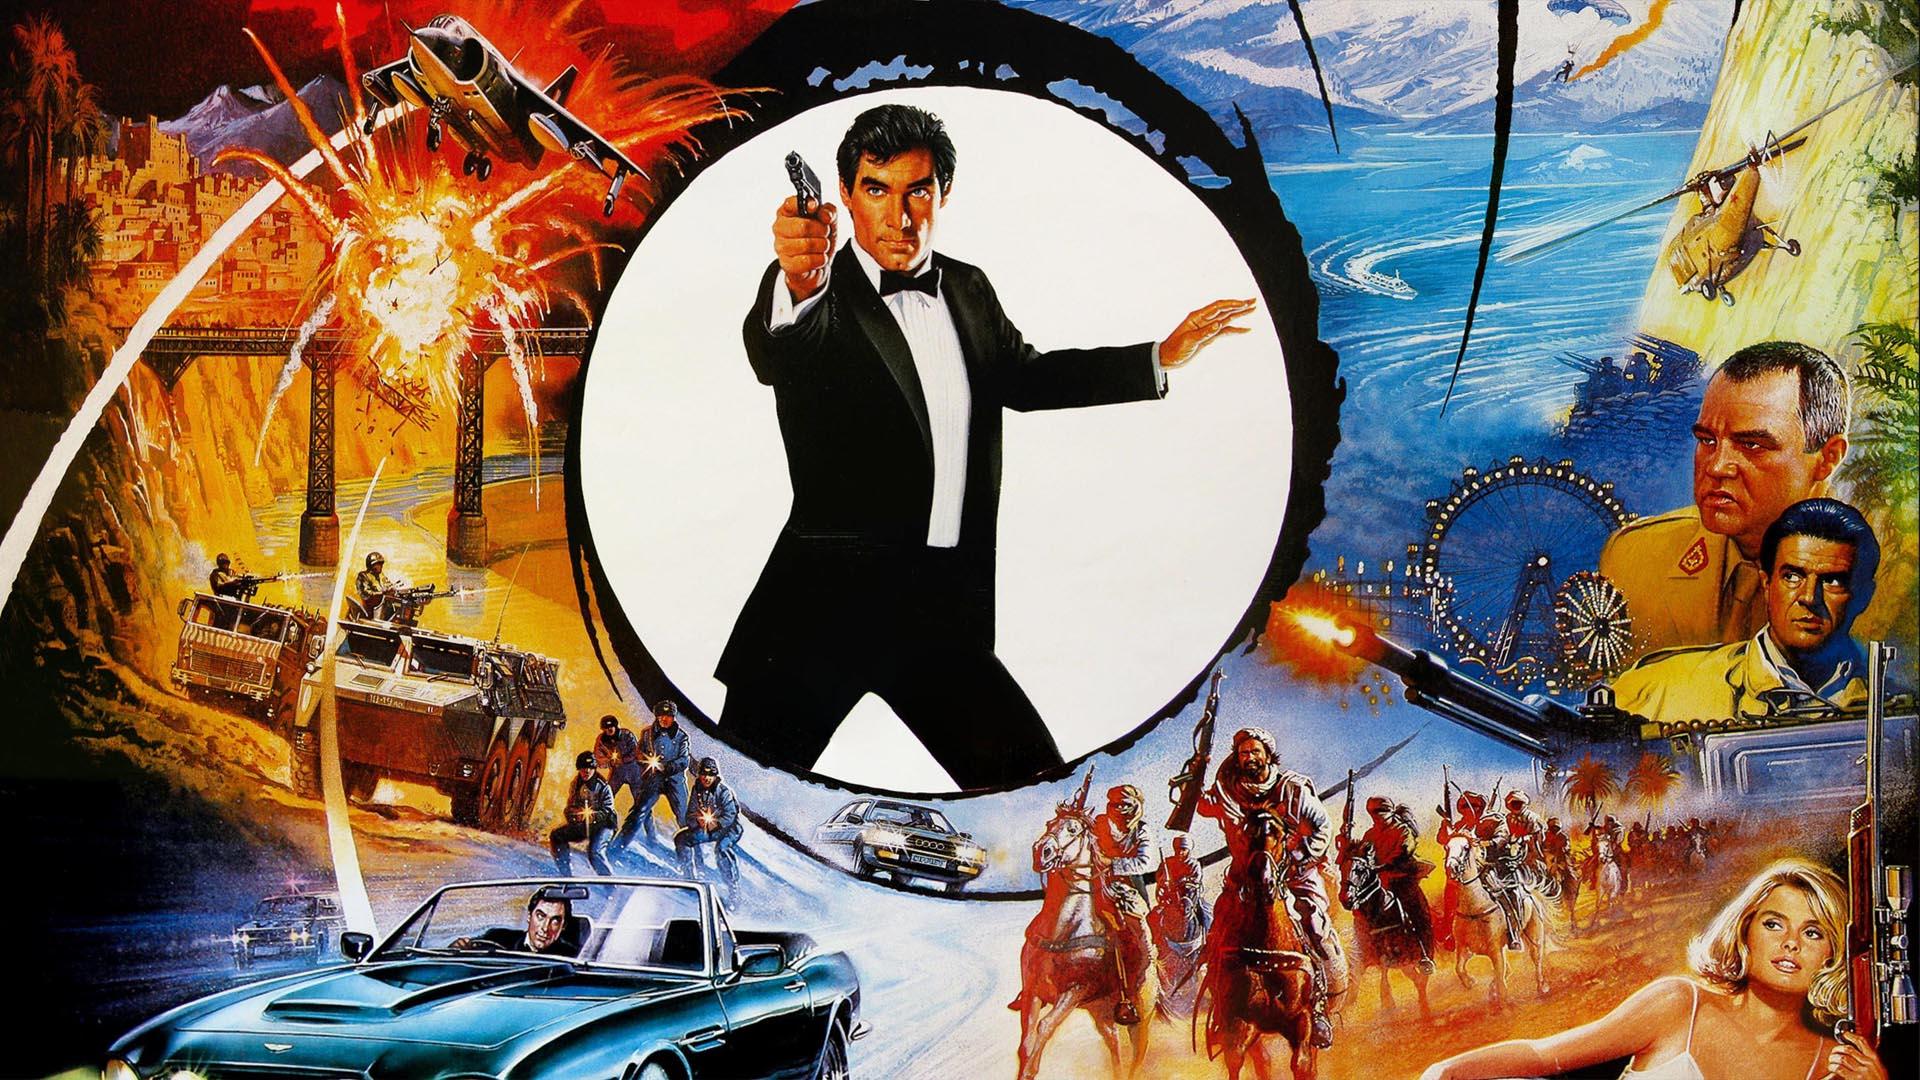 James Bond Iphone Wallpaper 007 Images Free Download Pixelstalk Net